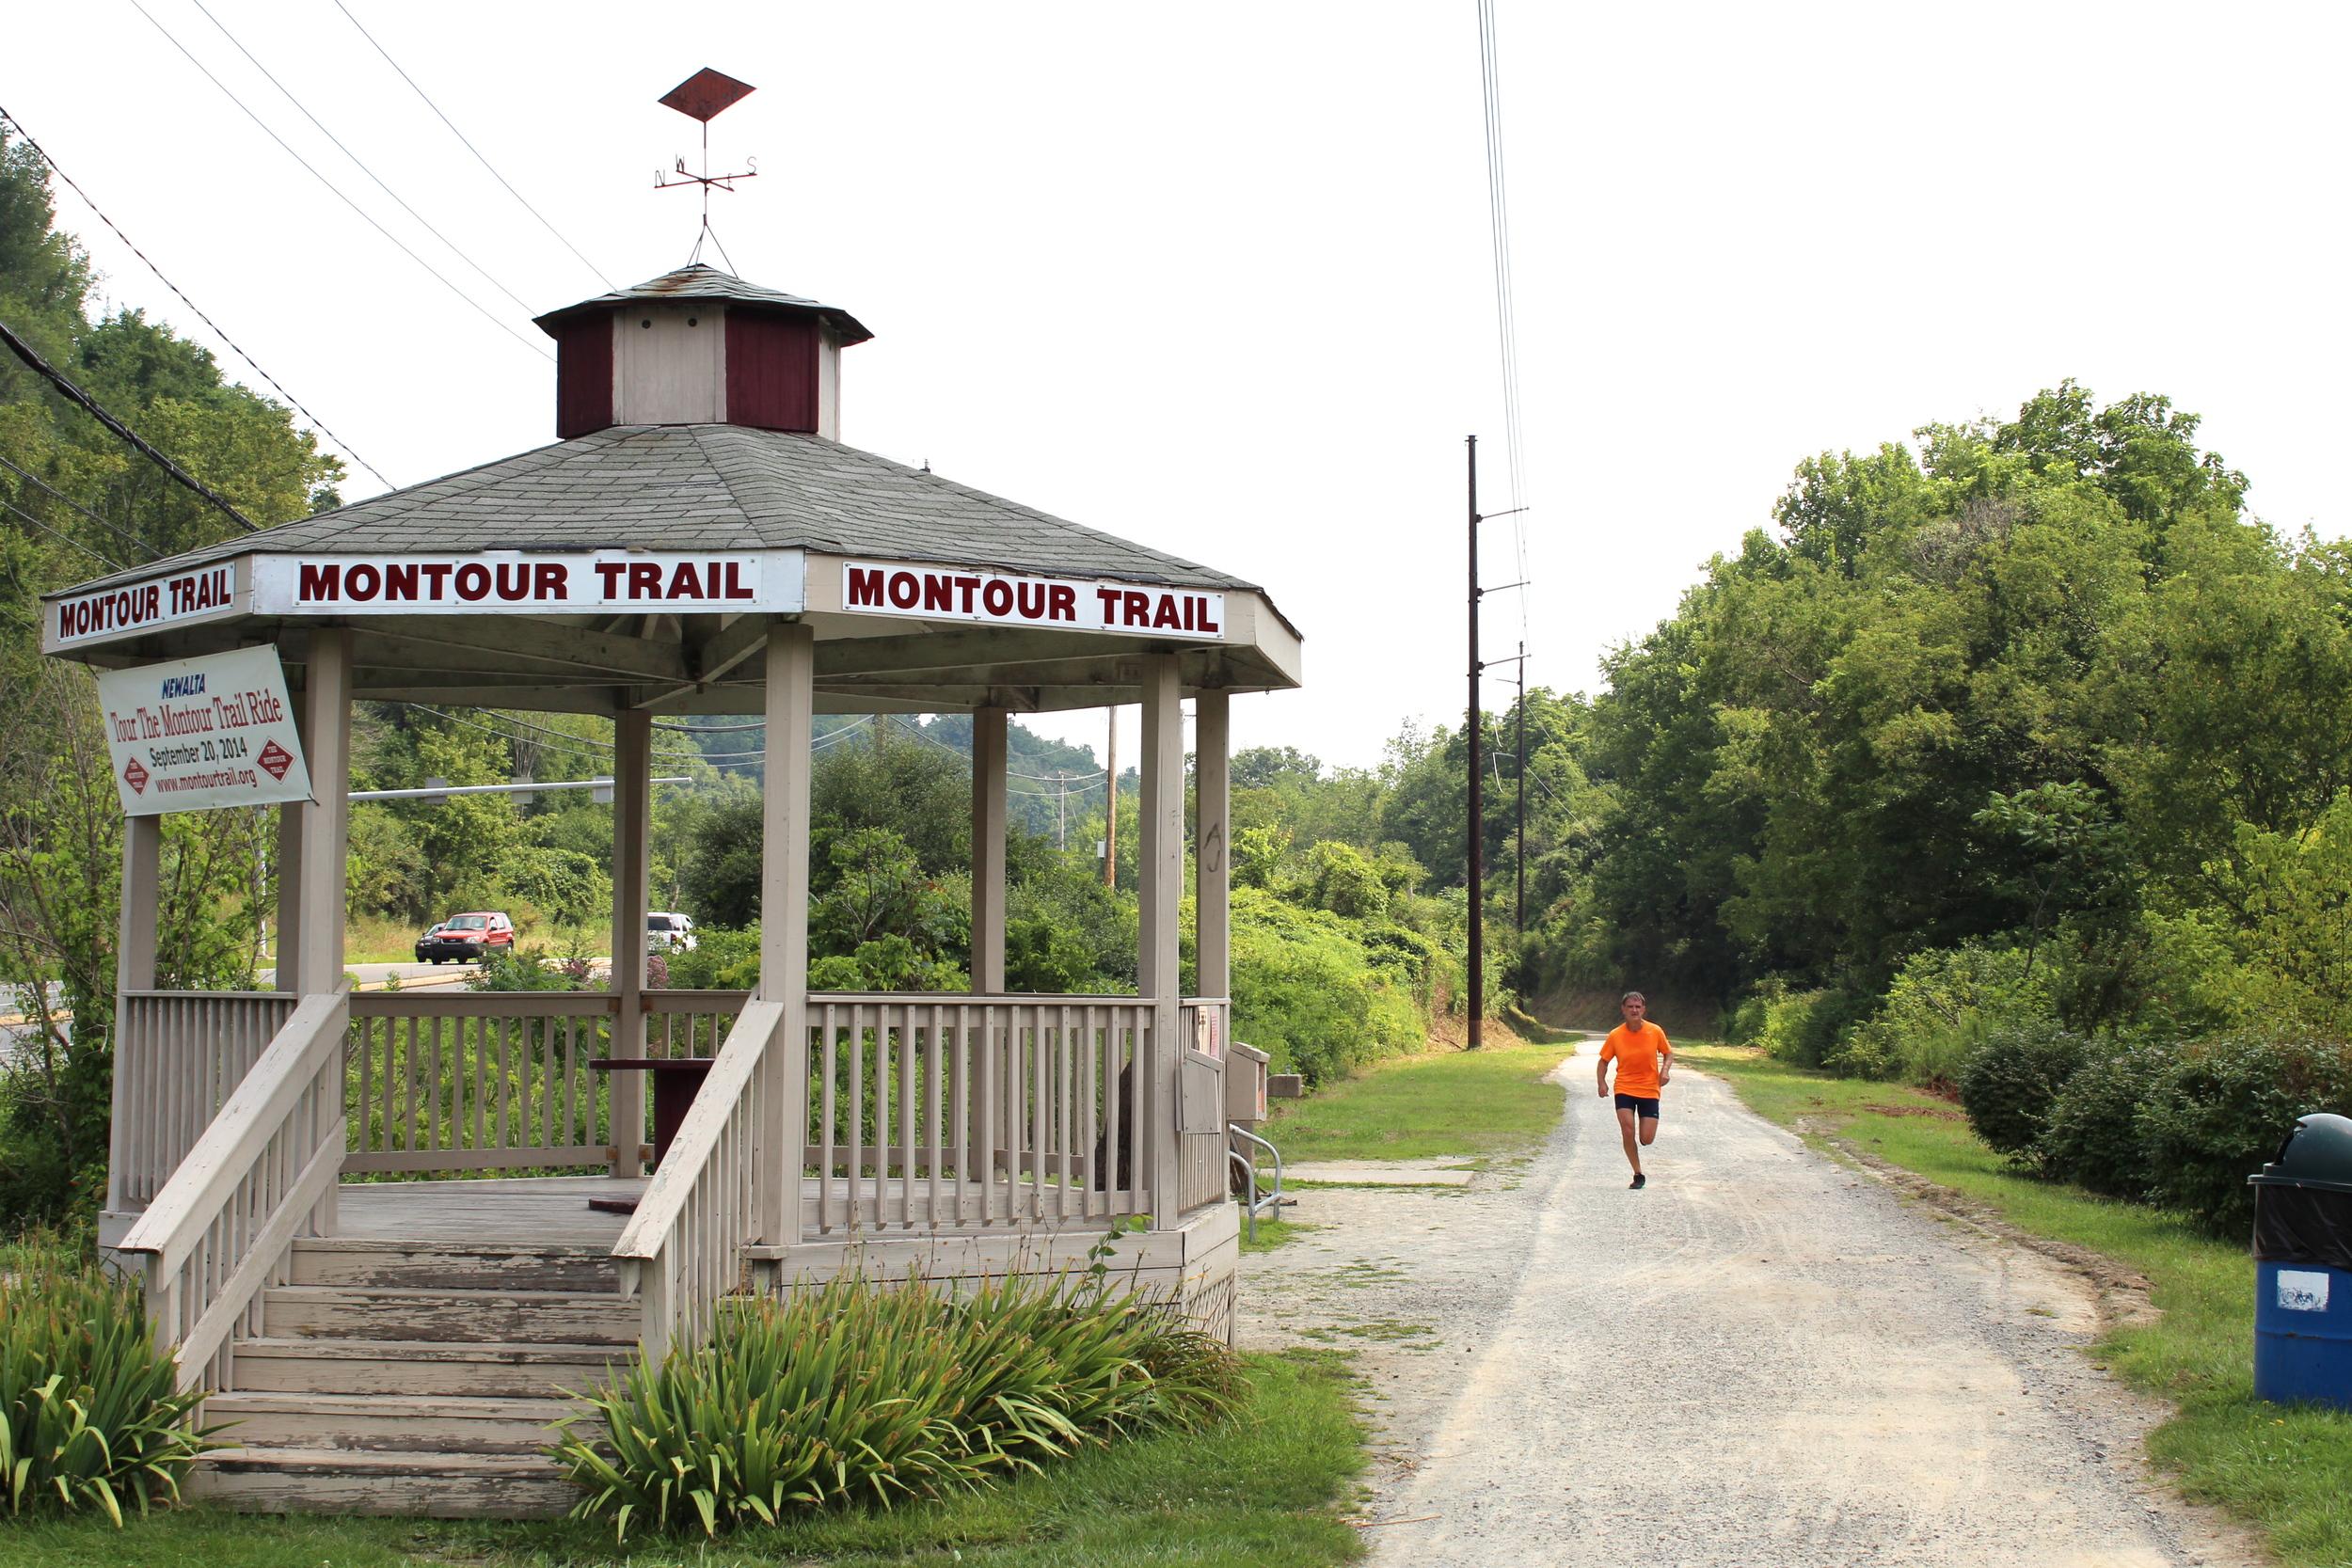 Gazebo on Montour Trail